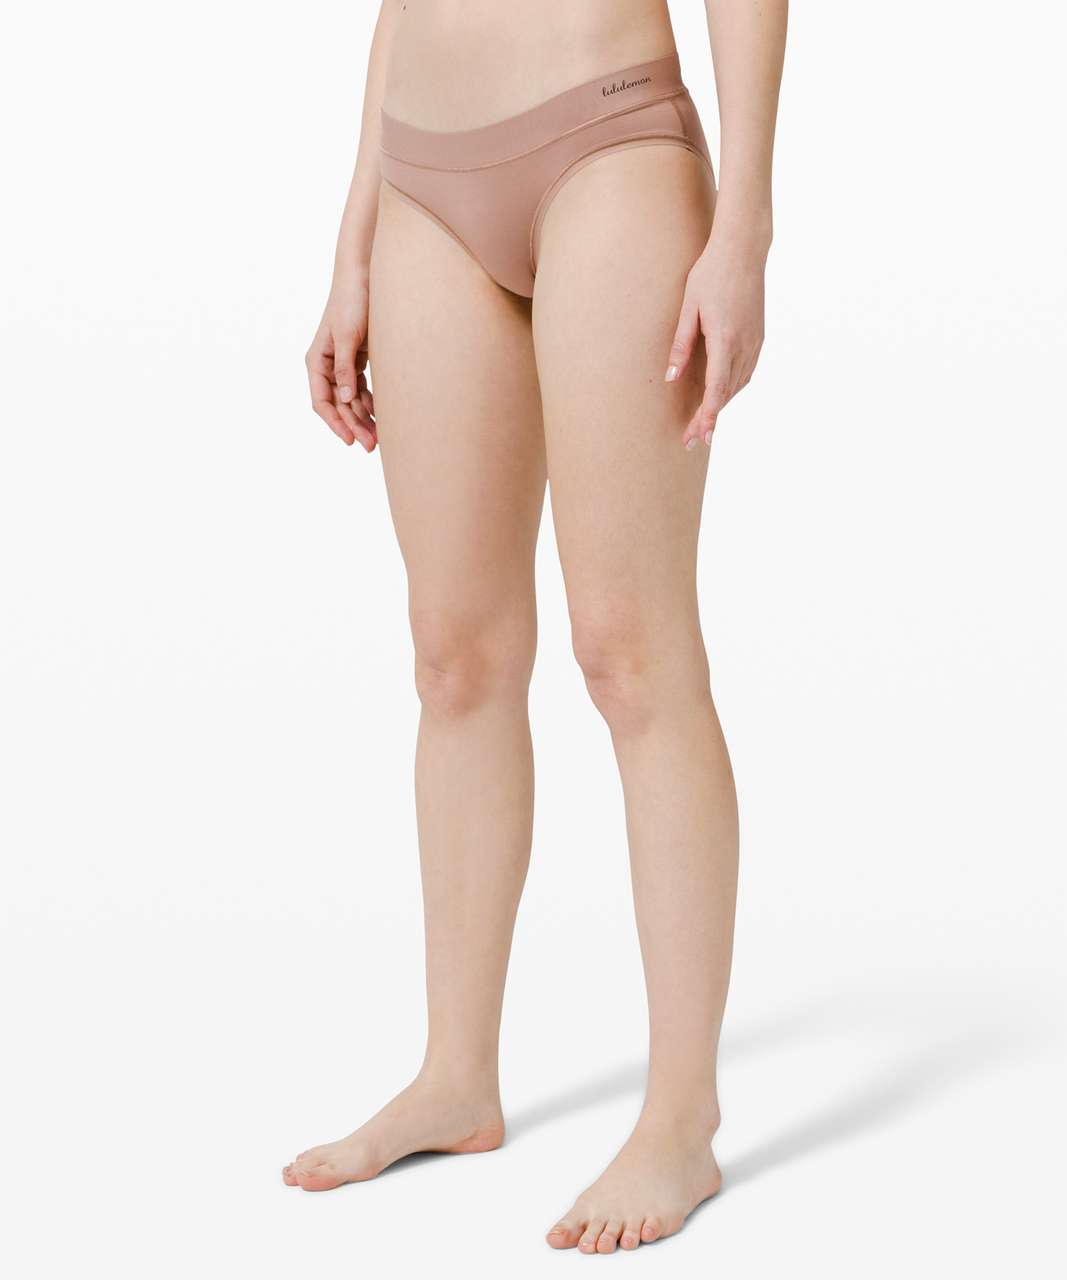 Lululemon Mula Bandhawear Bikini - Soft Sand